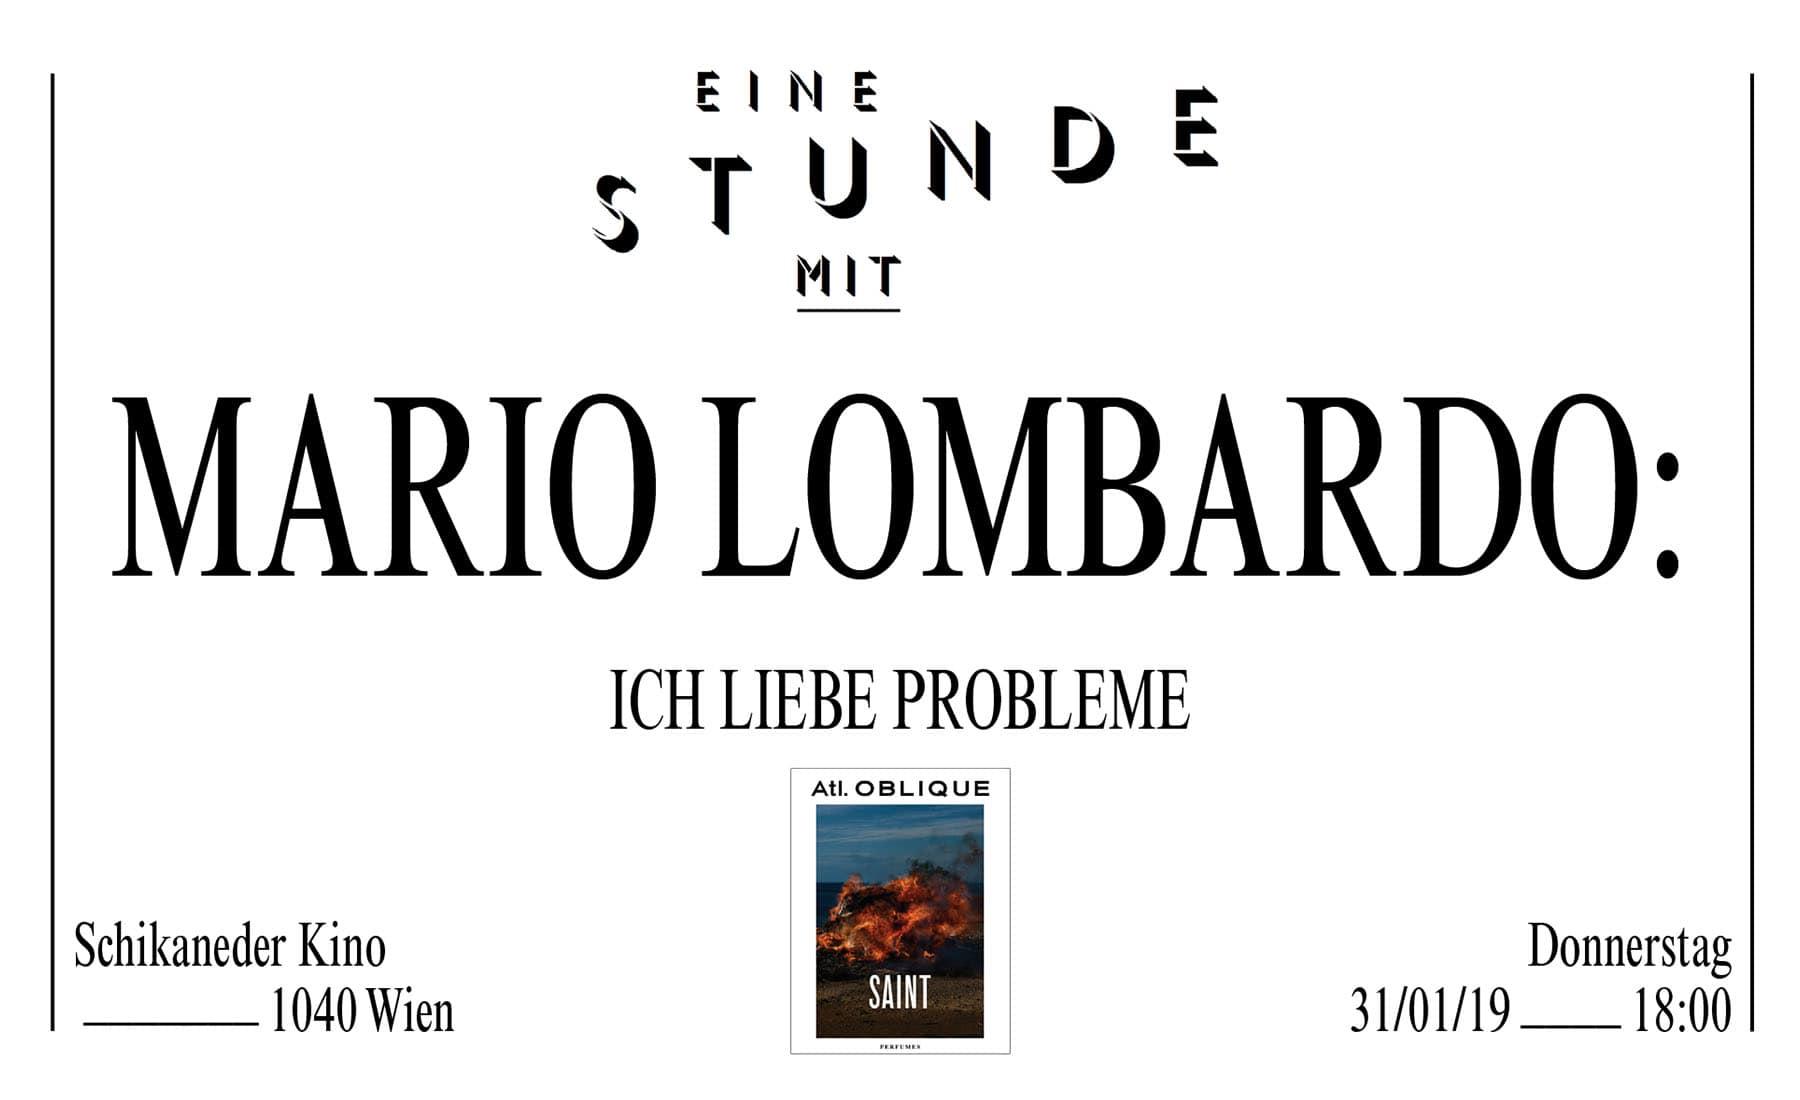 Forward-Calendar-January-Eine-Stunde-Lombardo